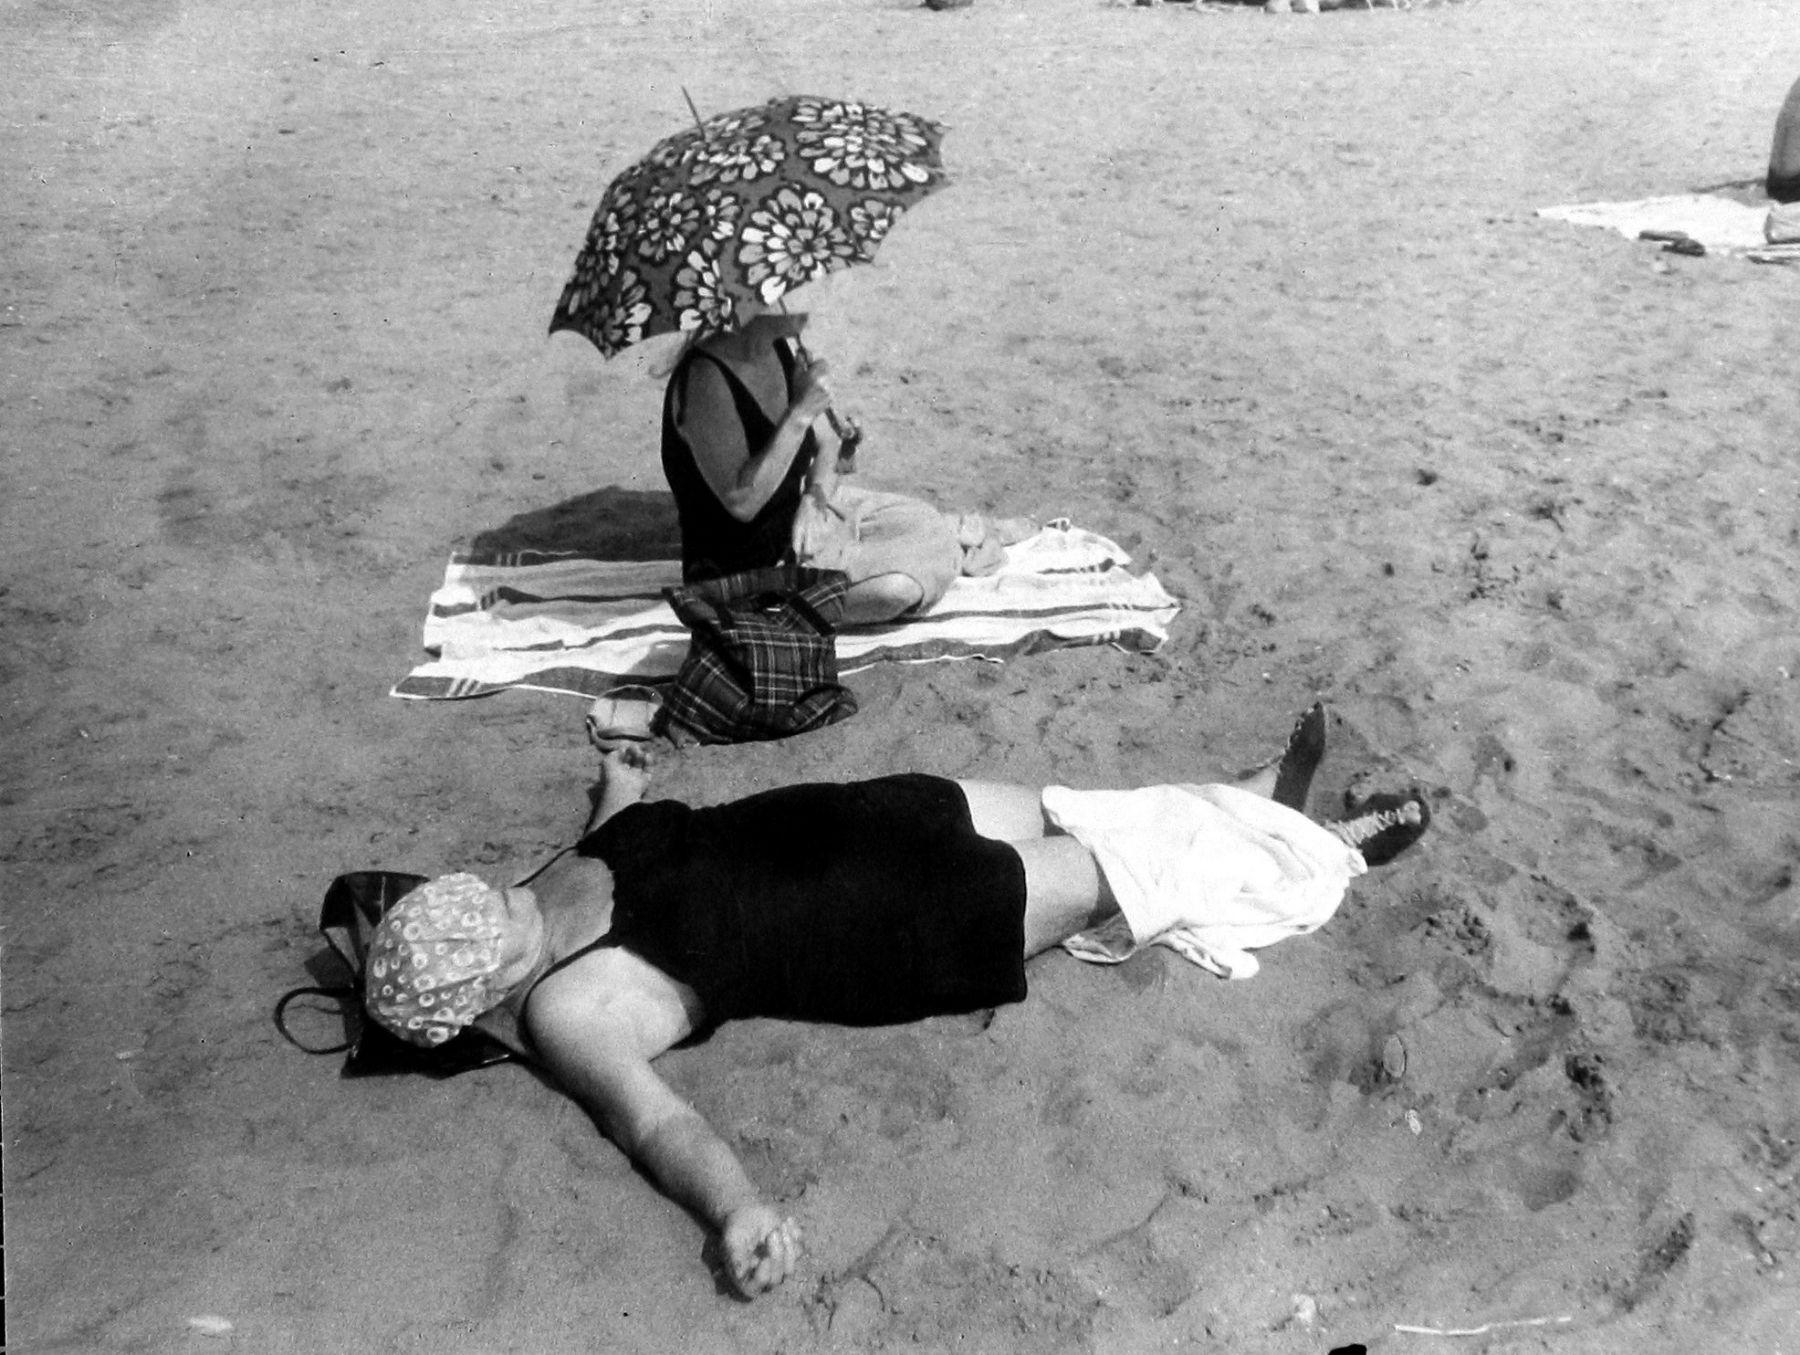 Leon Levinstein - Coney Island (two women and umbrella), c.1960 - Howard Greenberg Gallery - 2018